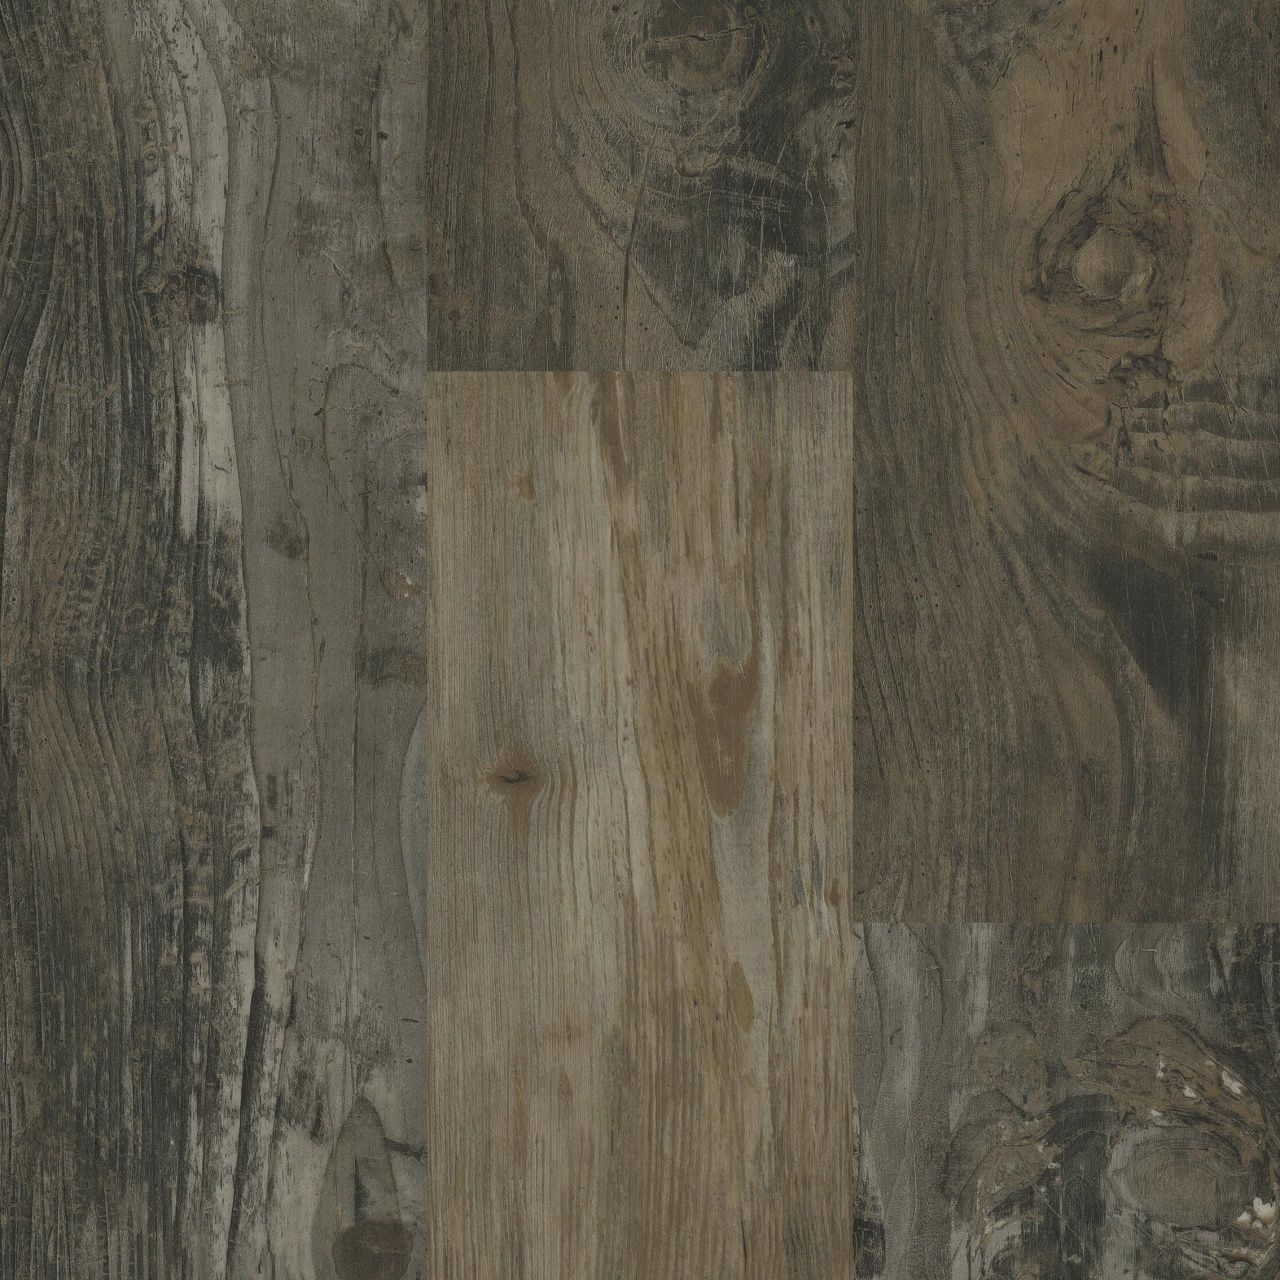 Cheap Vinyl Flooring Near Me In 2020 Vinyl Plank Flooring Luxury Vinyl Plank Flooring Installing Vinyl Plank Flooring